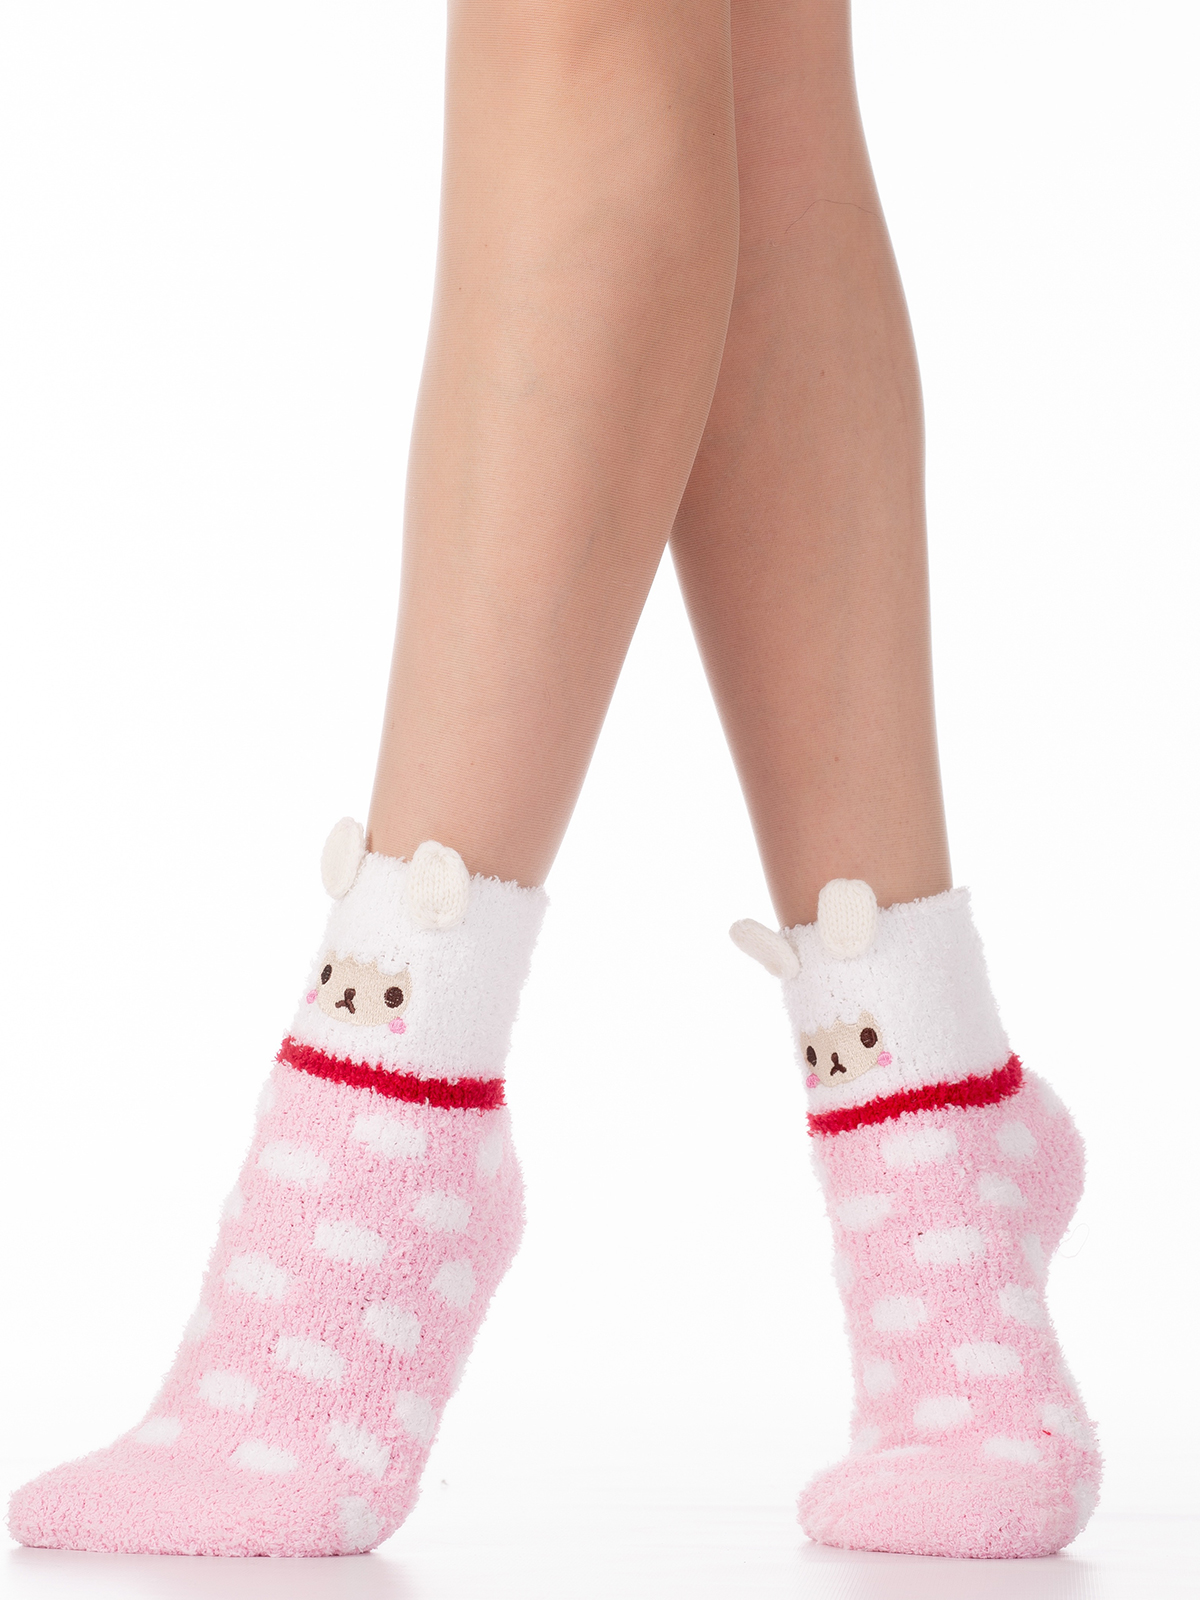 Носки женские Hobby Line HOBBY 2361-1 розовые 36-40